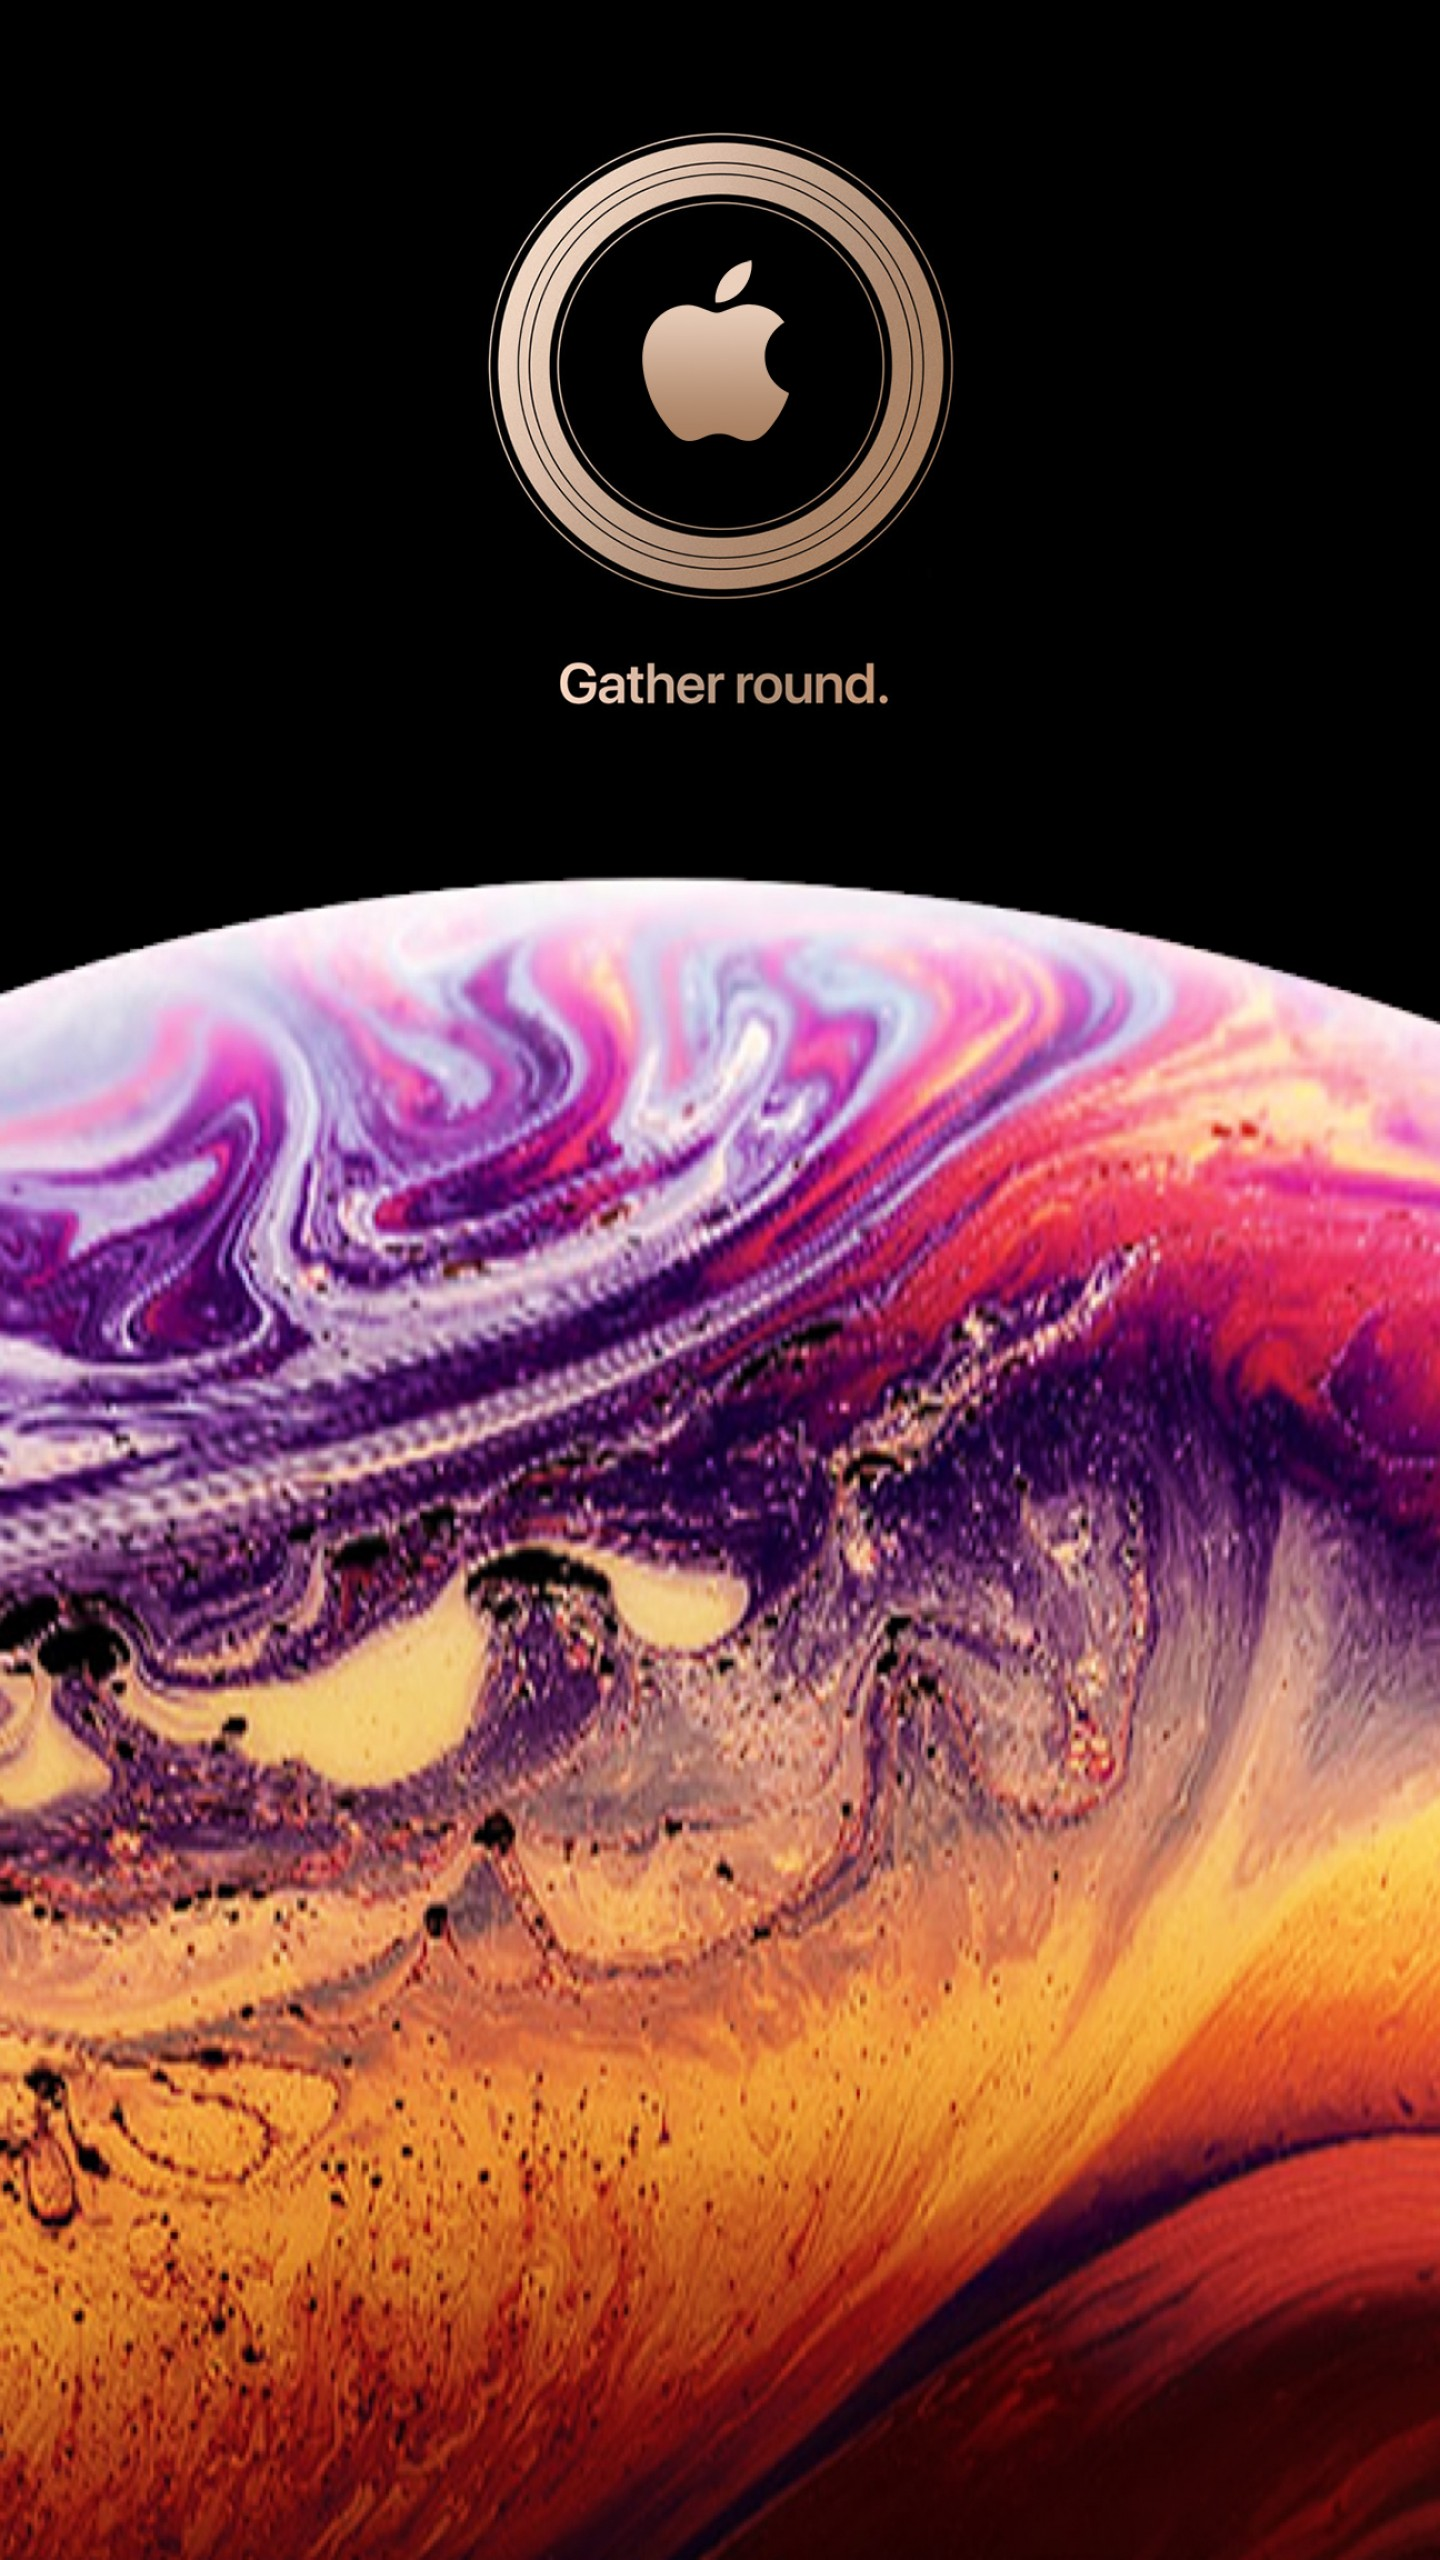 Iphone X Wallpaper For Pc - HD Wallpaper